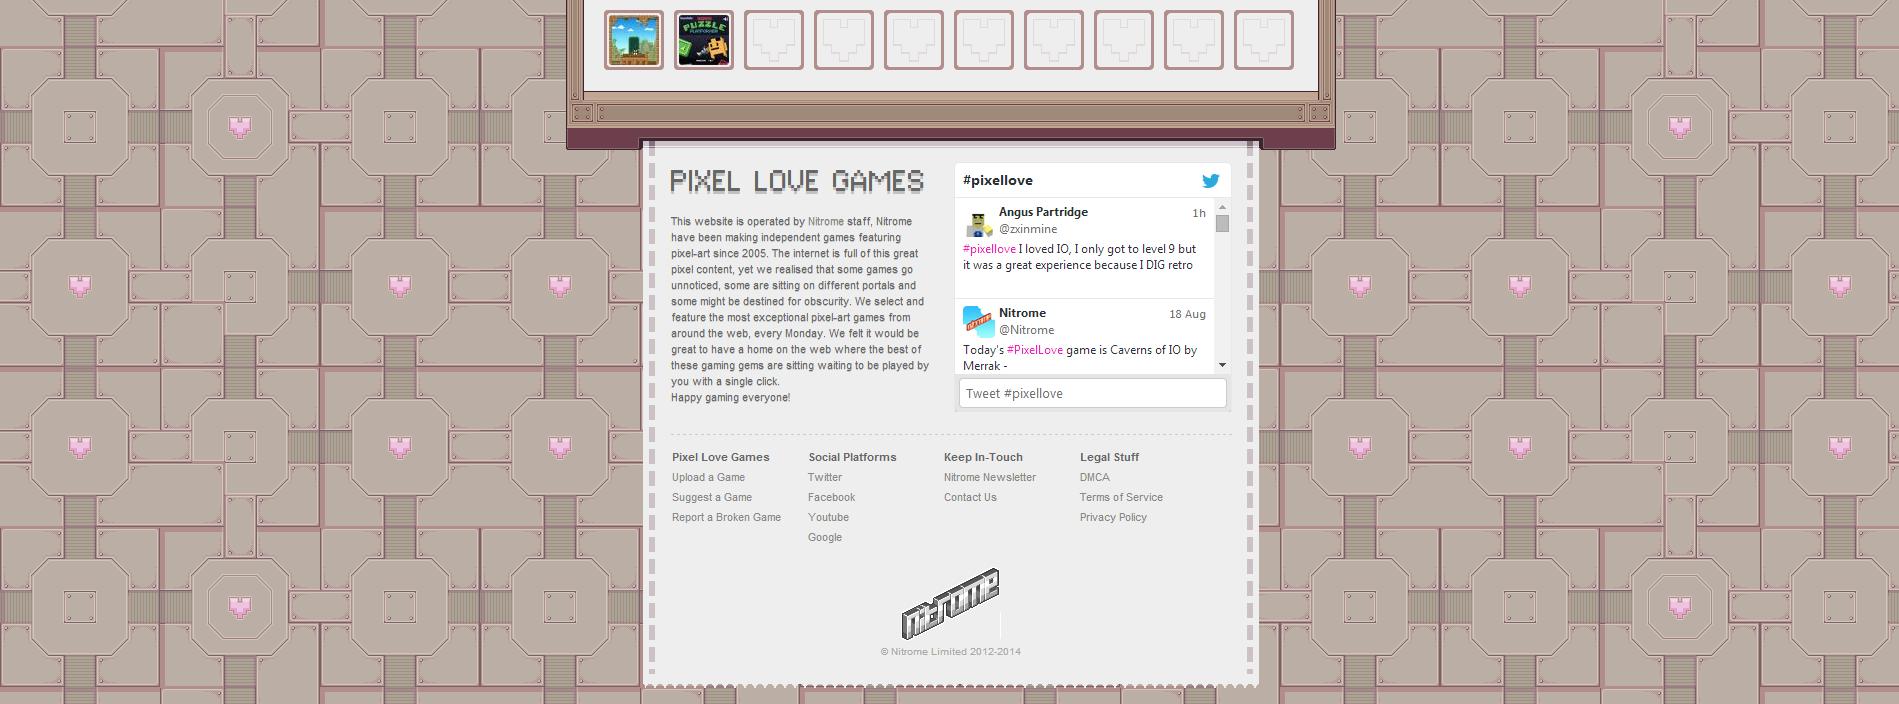 Violence Free Games - fukgames.com